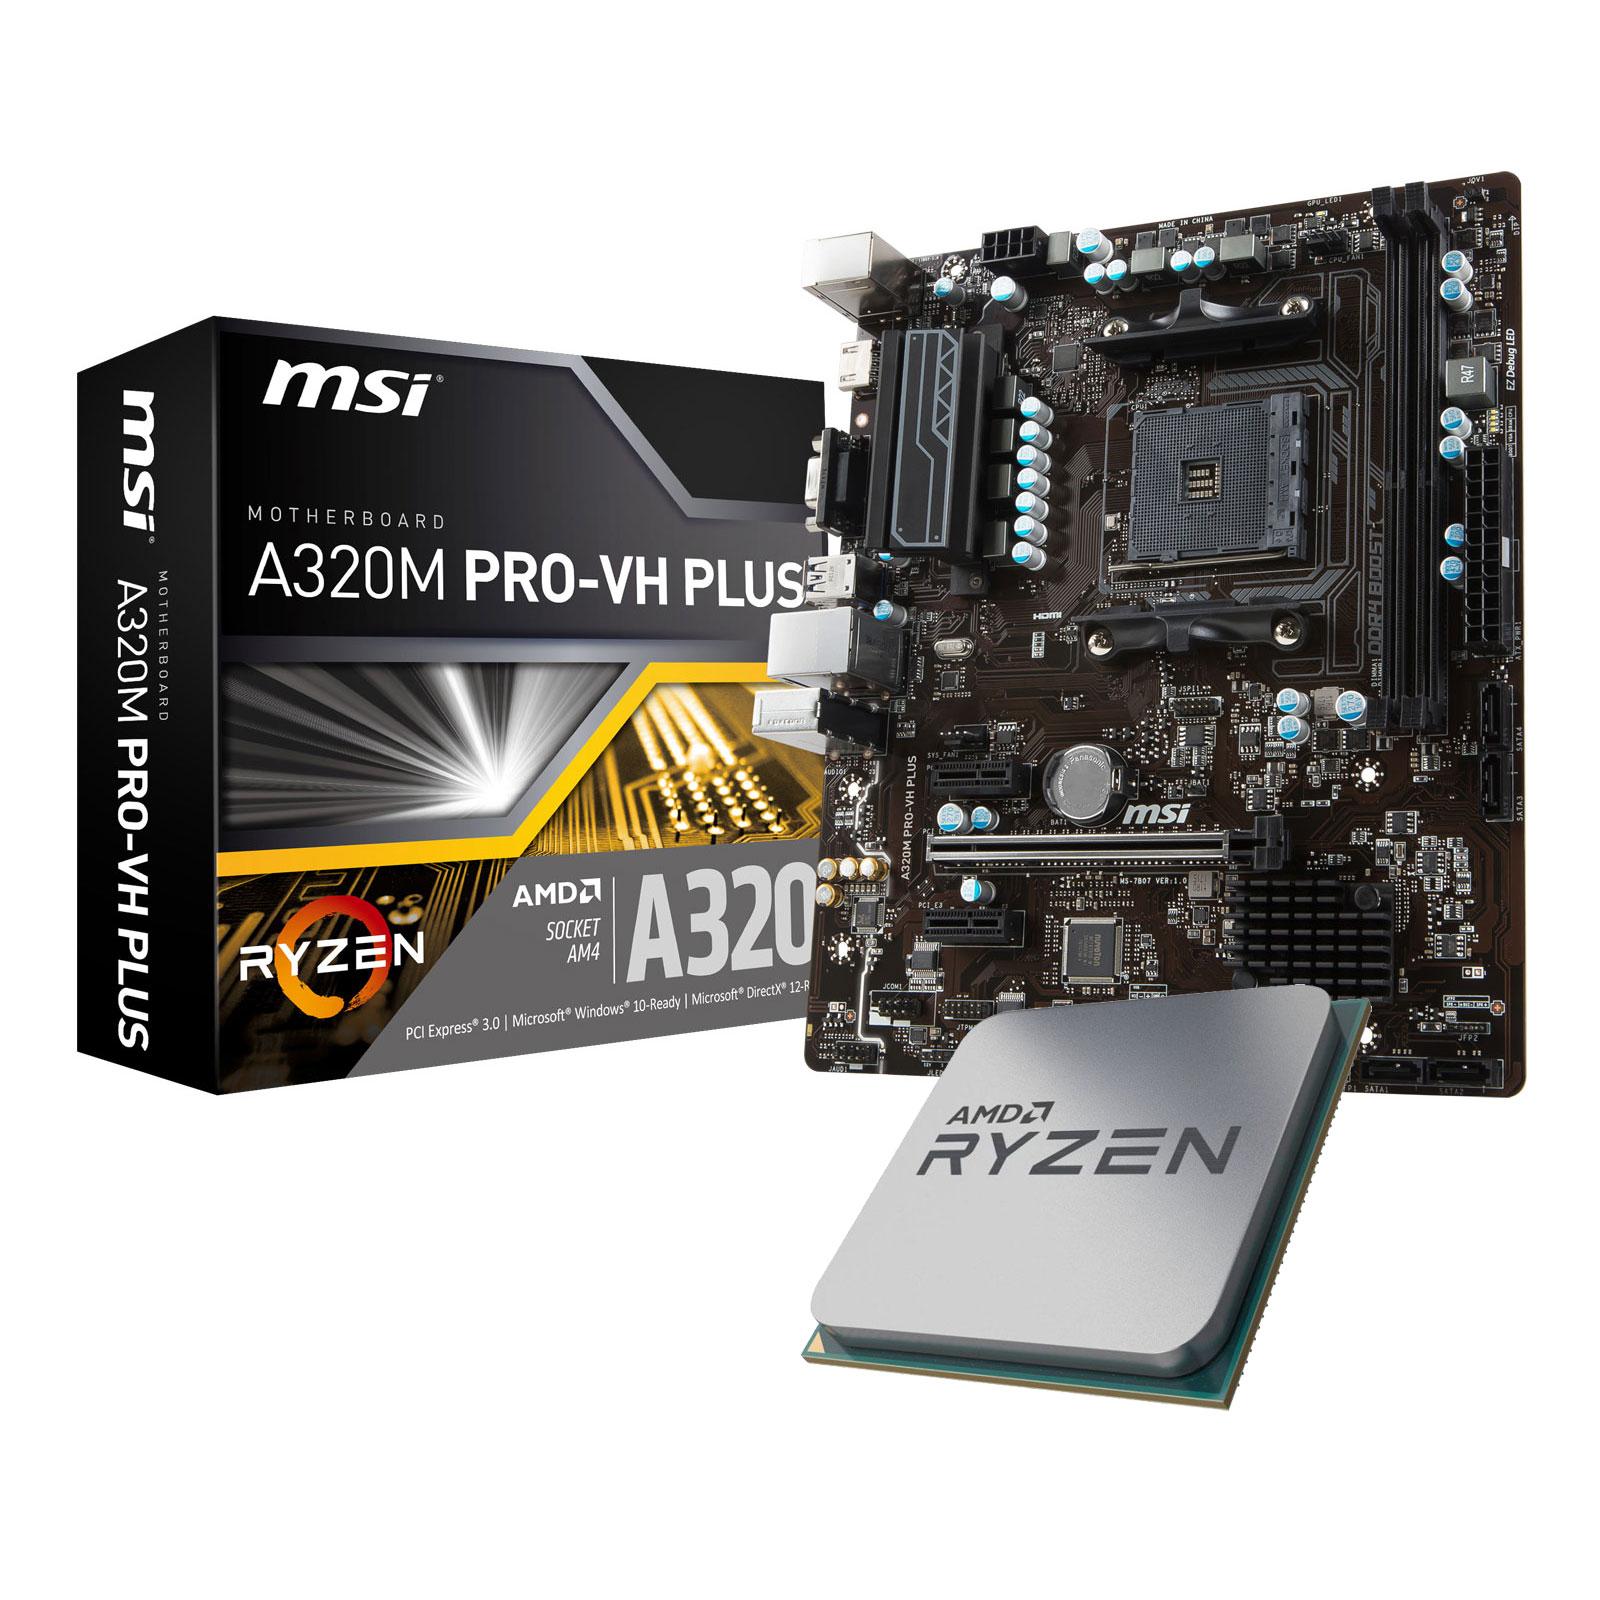 Kit upgrade PC Kit Upgrade PC AMD Ryzen 5 2400G MSI A320M PRO-VH PLUS Carte mère Micro ATX Socket AM4 AMD A320 + CPU AMD Ryzen 5 2400G (3.6 GHz)